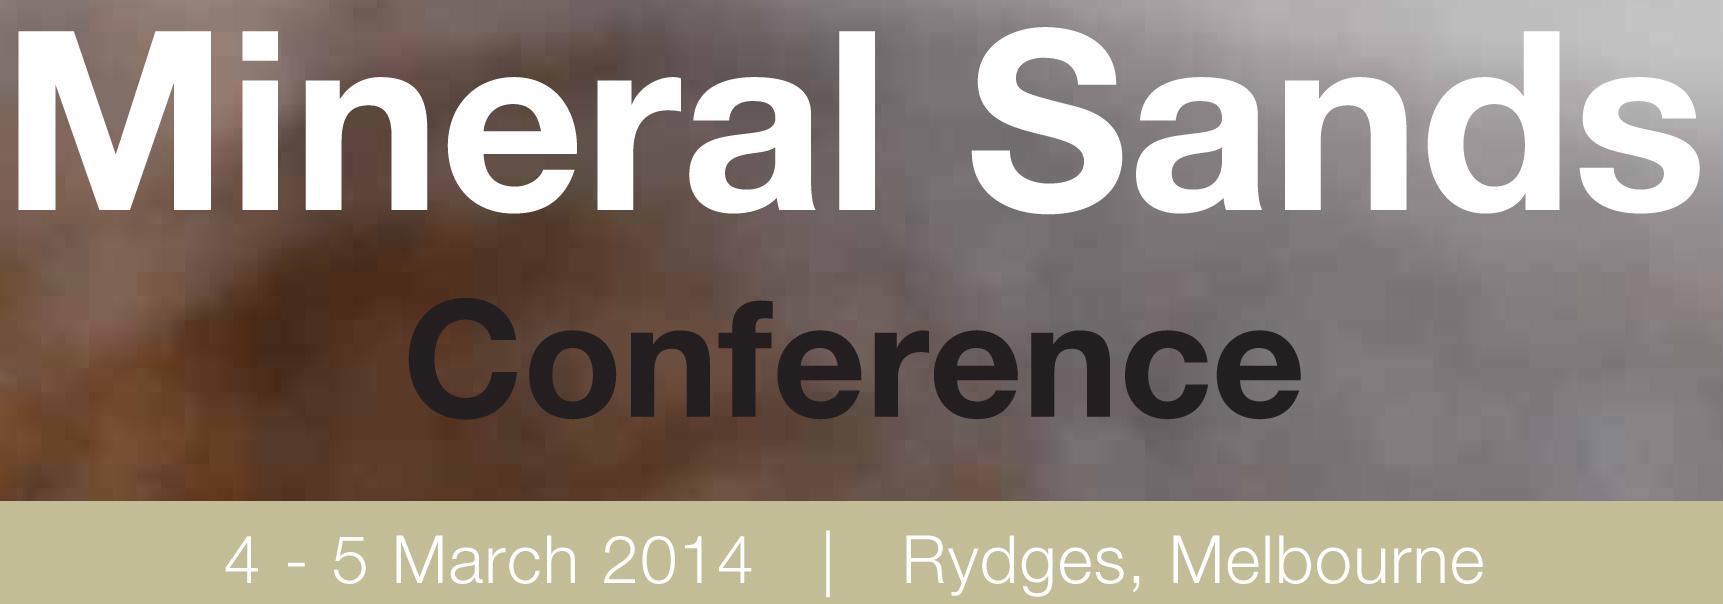 Mineral sands conference